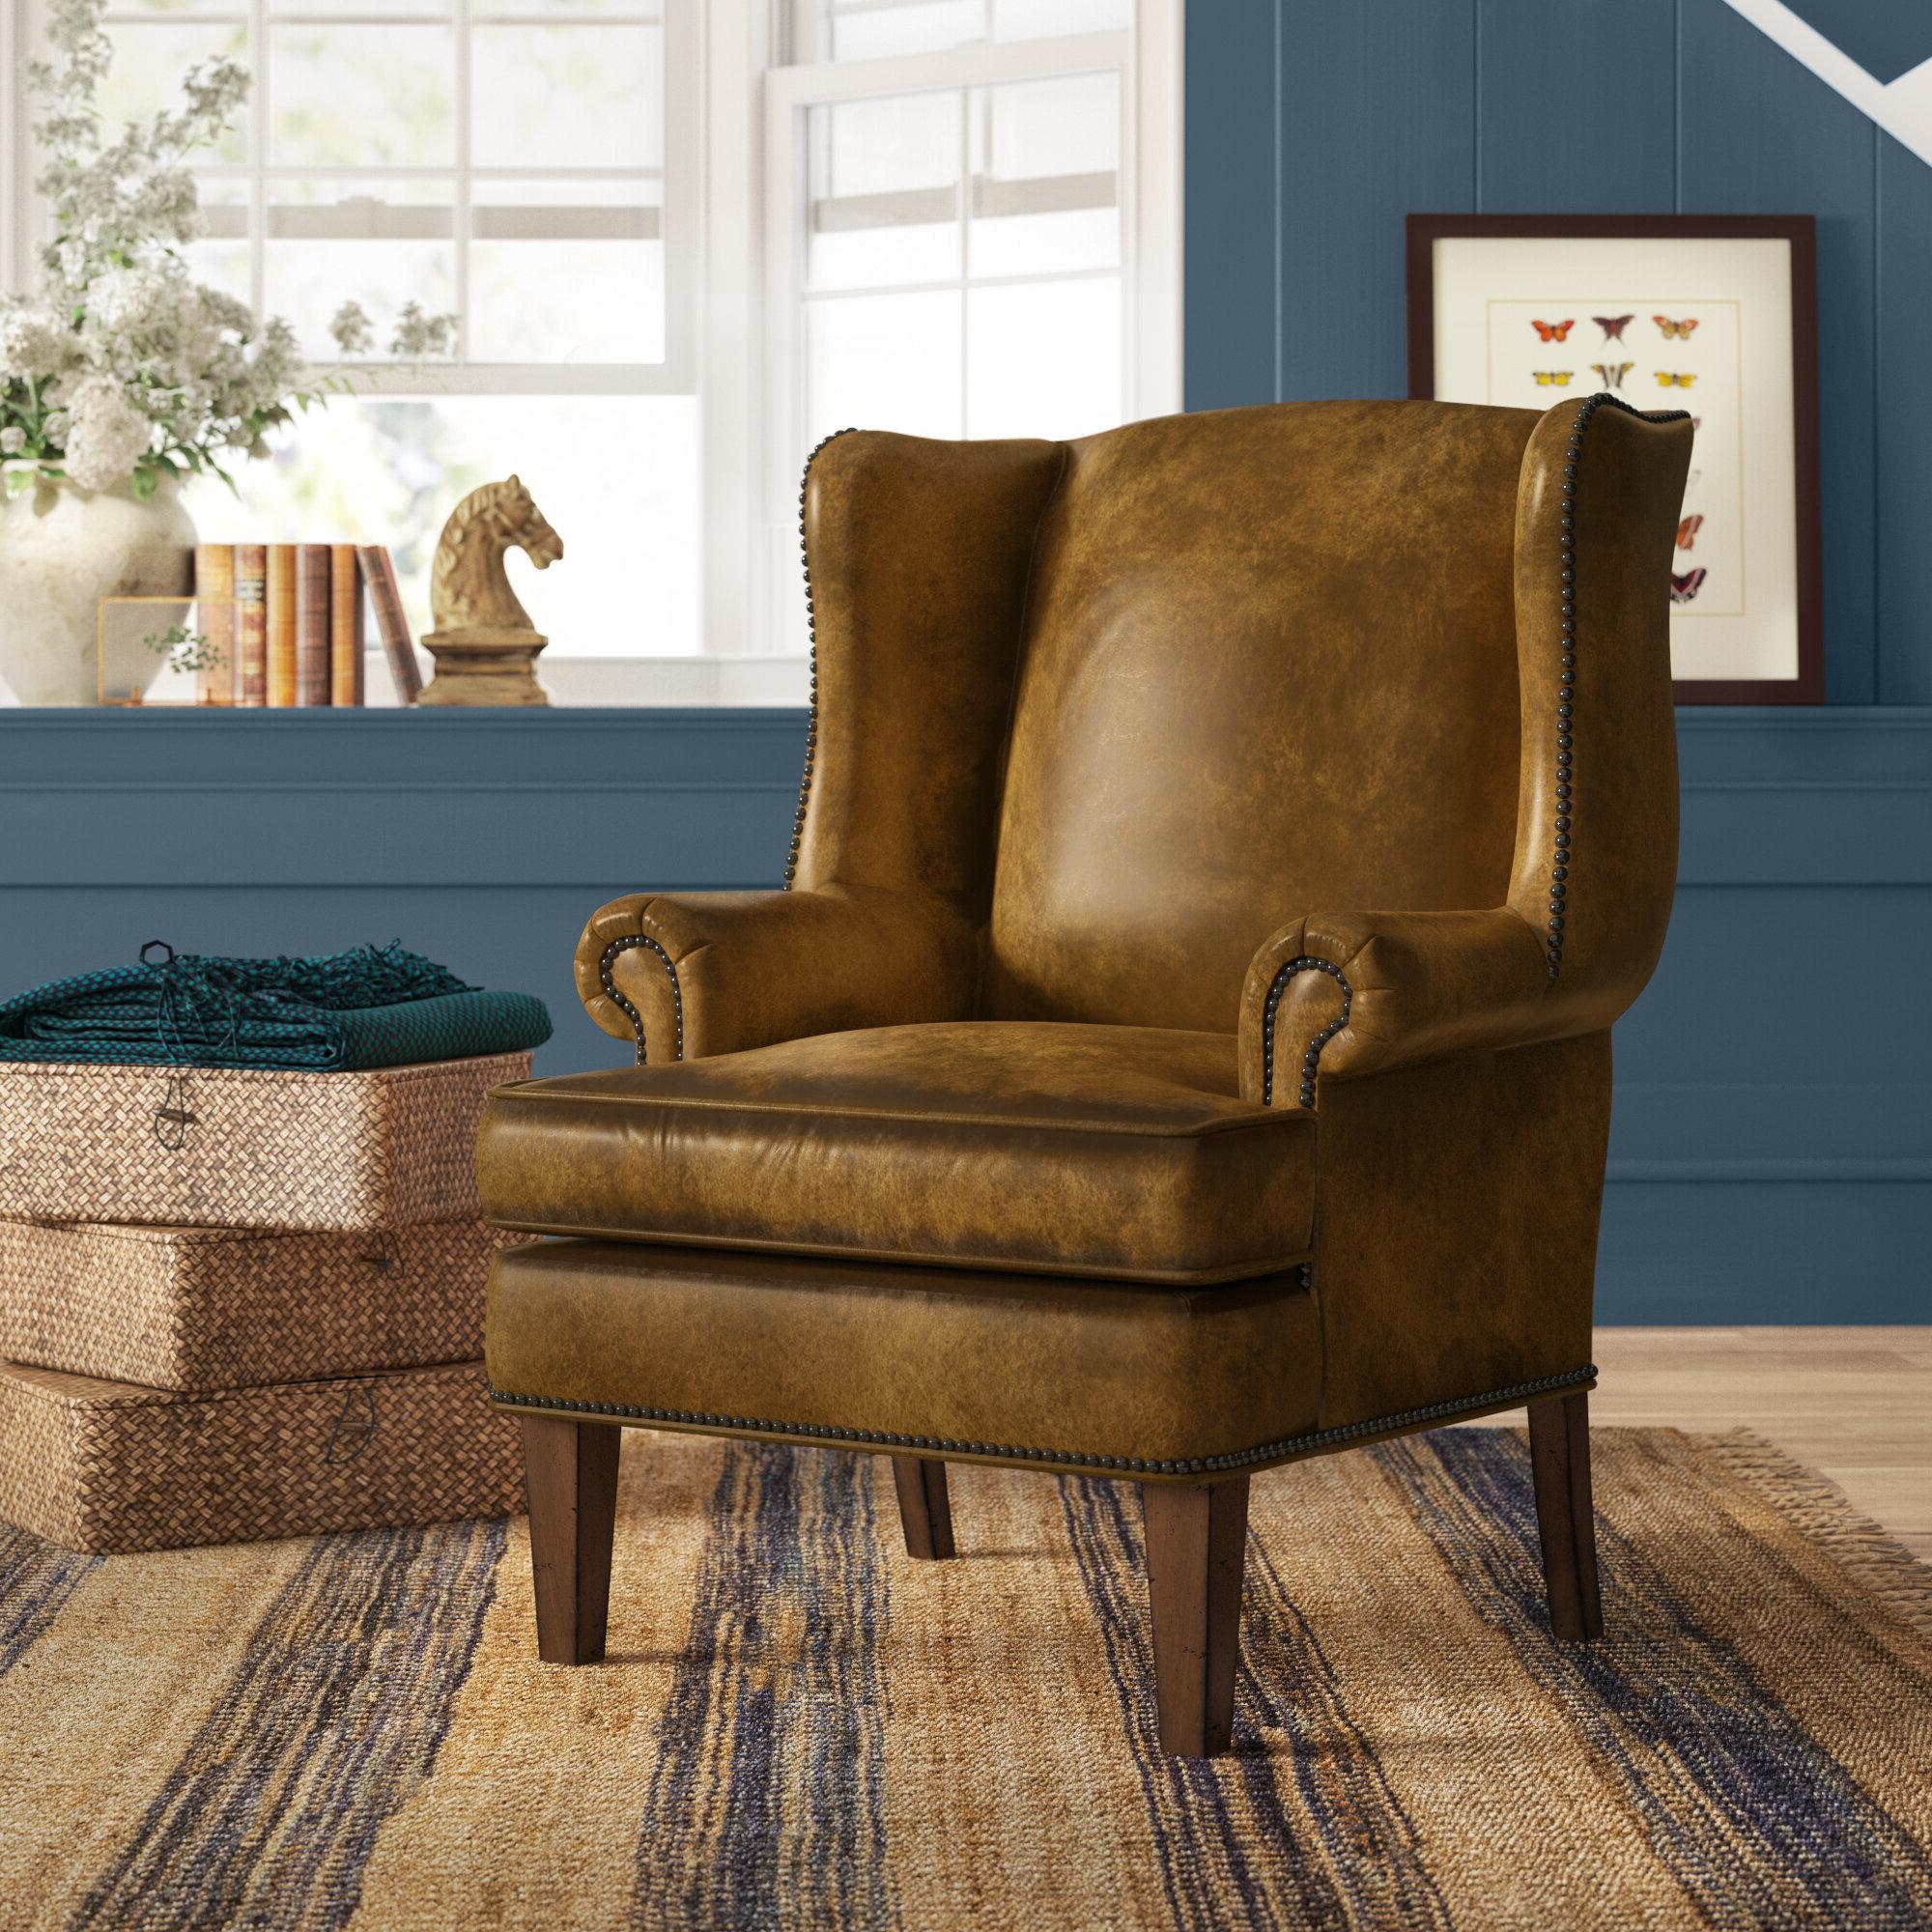 Wayfair Regarding Gallin Wingback Chairs (View 6 of 20)